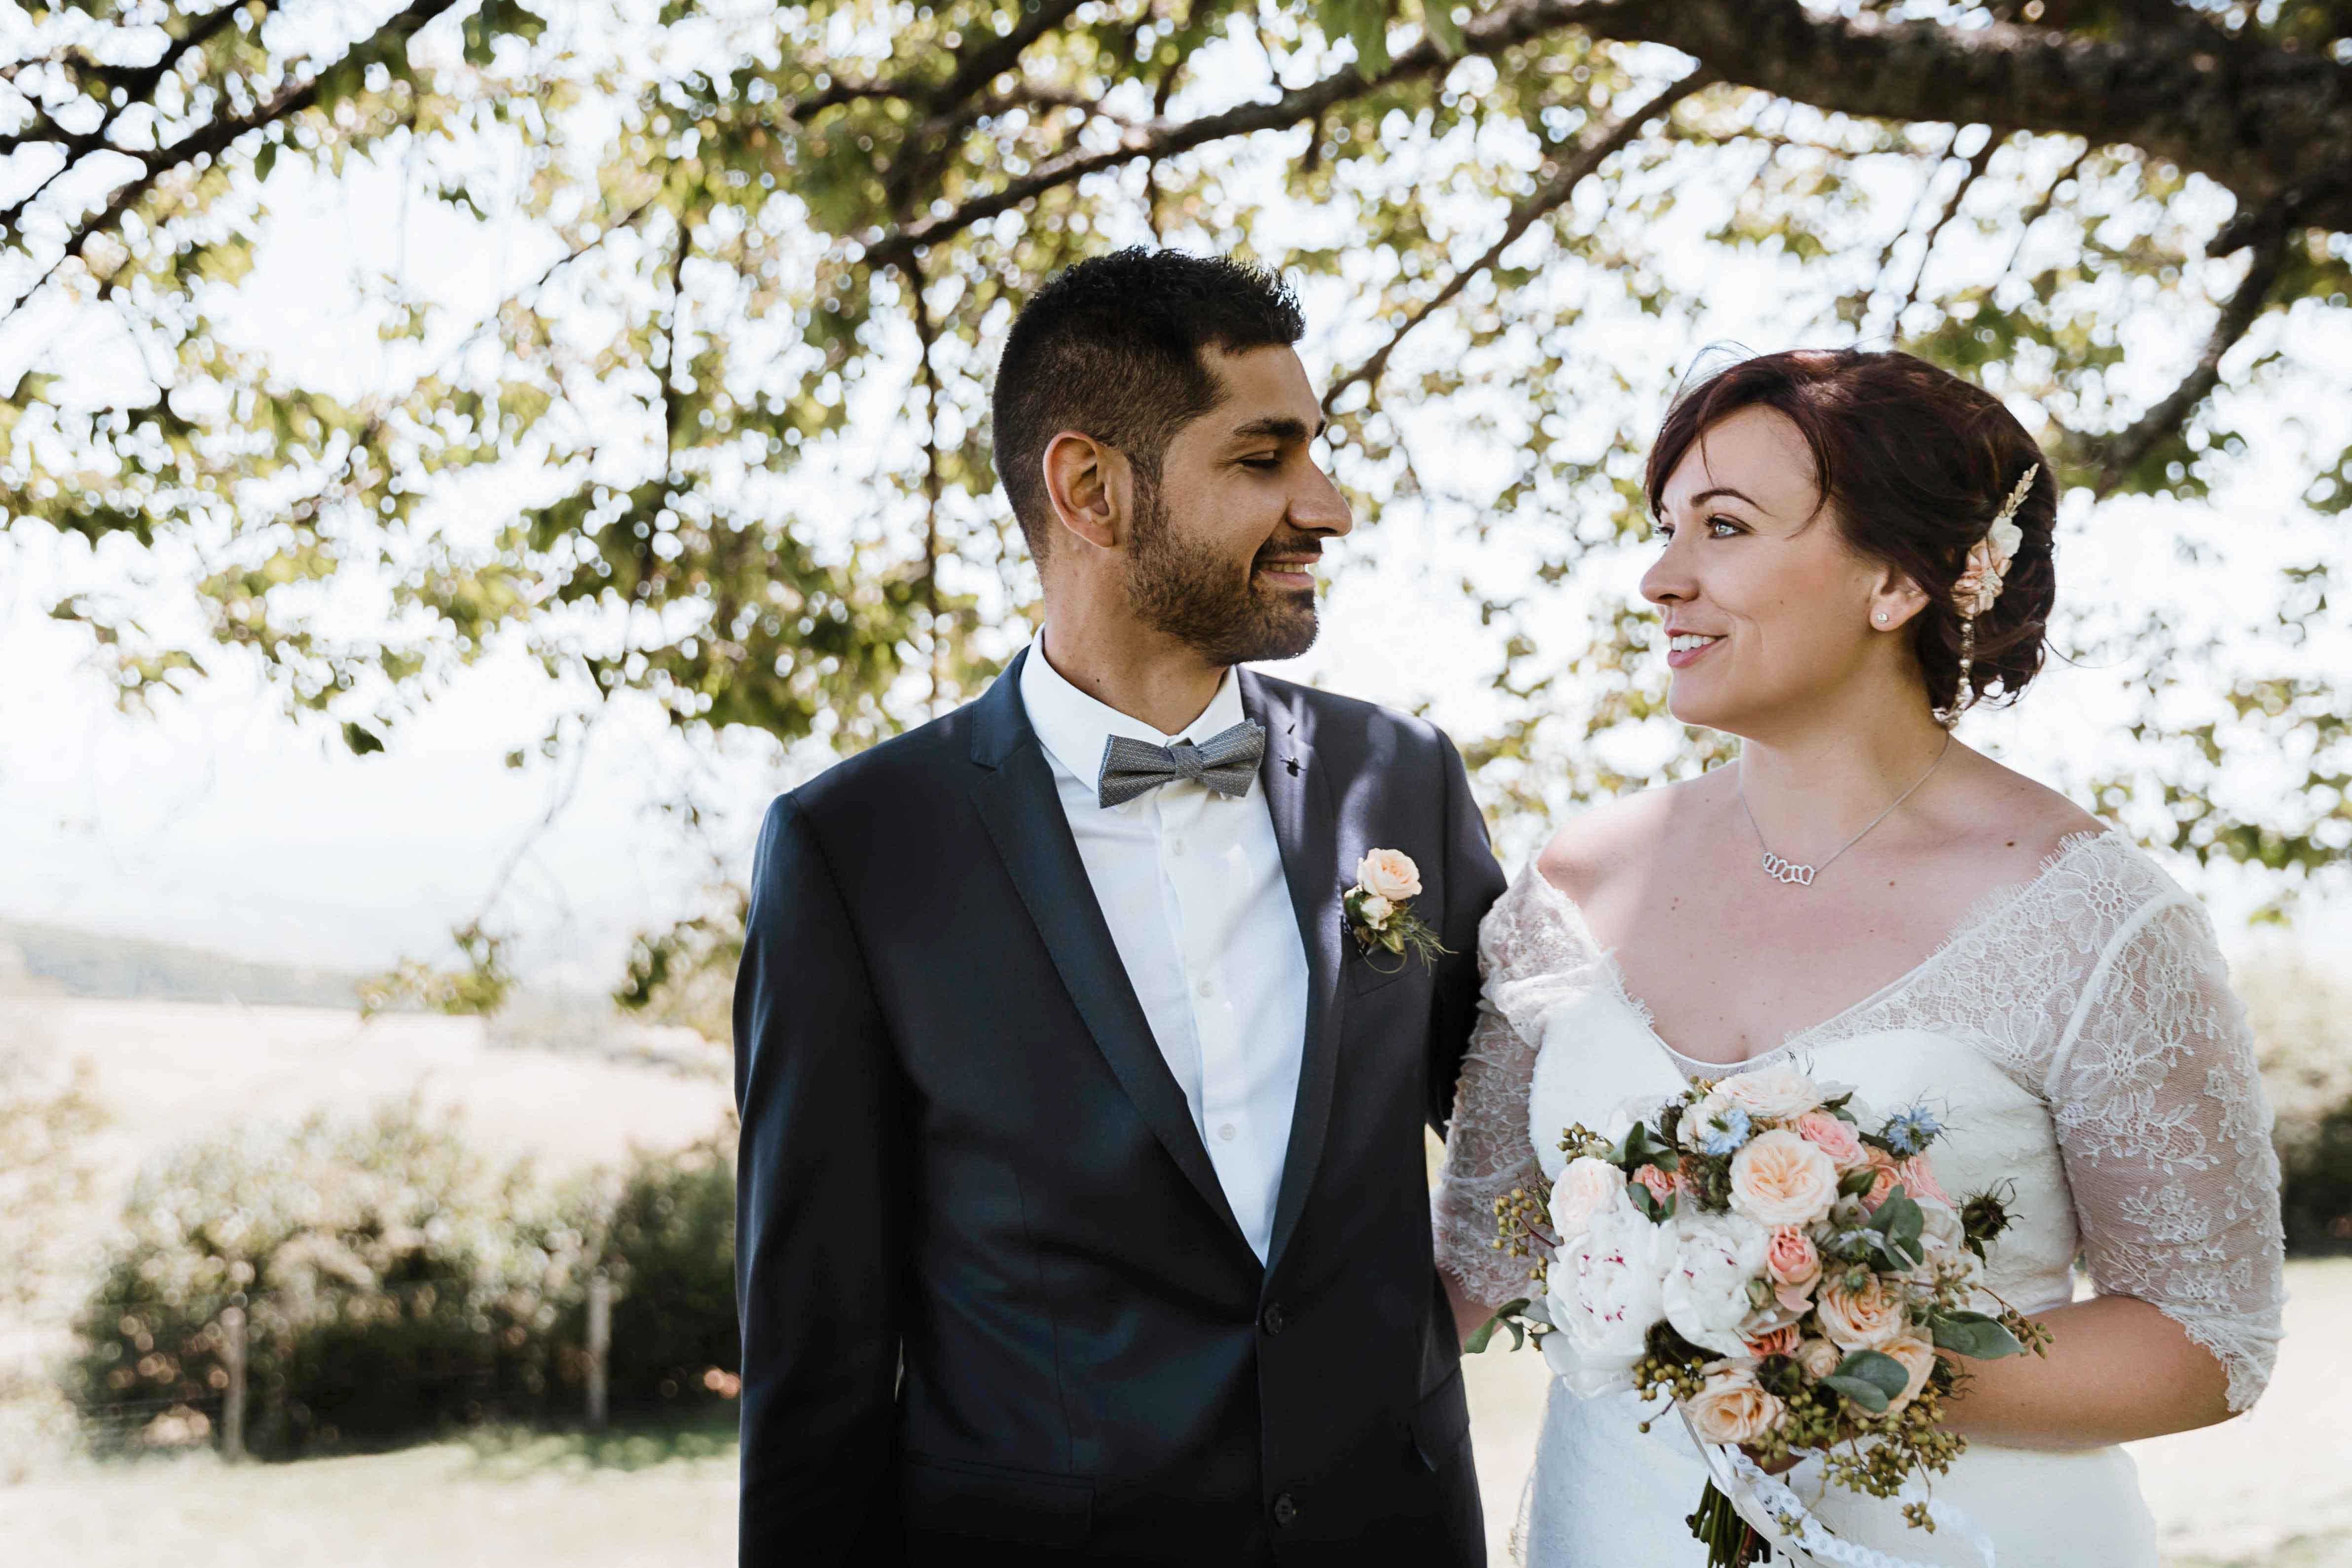 photographe beaujolais lyon avenas mariage photo couple